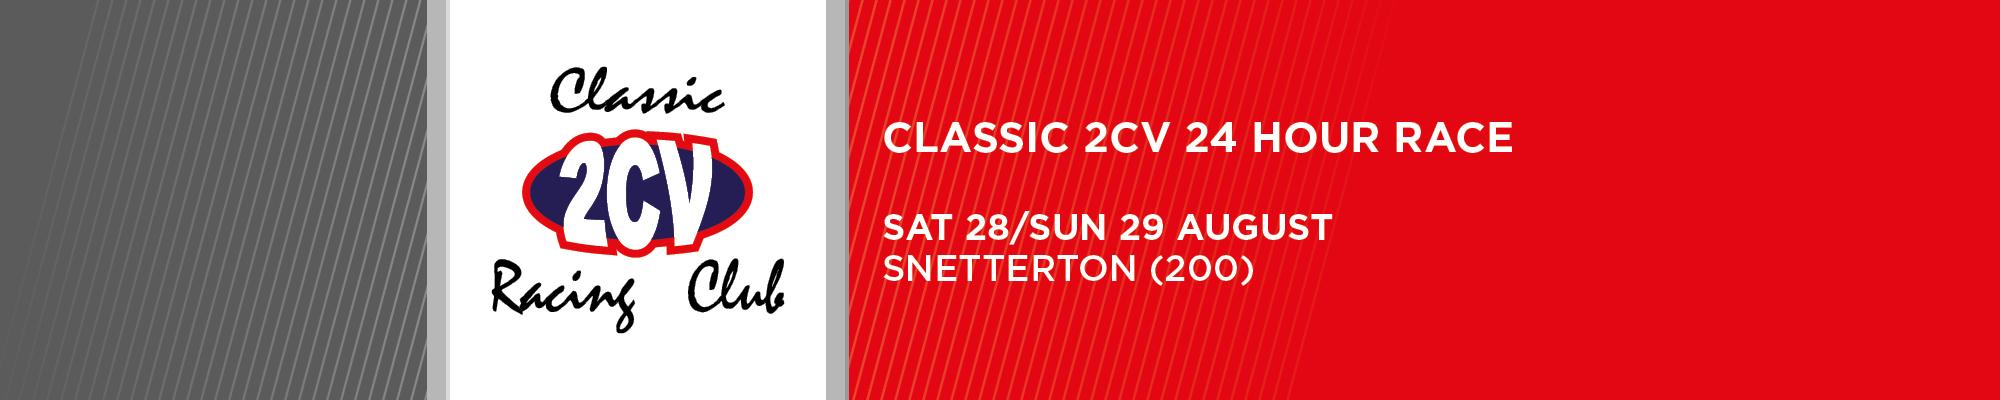 Classic 2CV 24 Hour Race